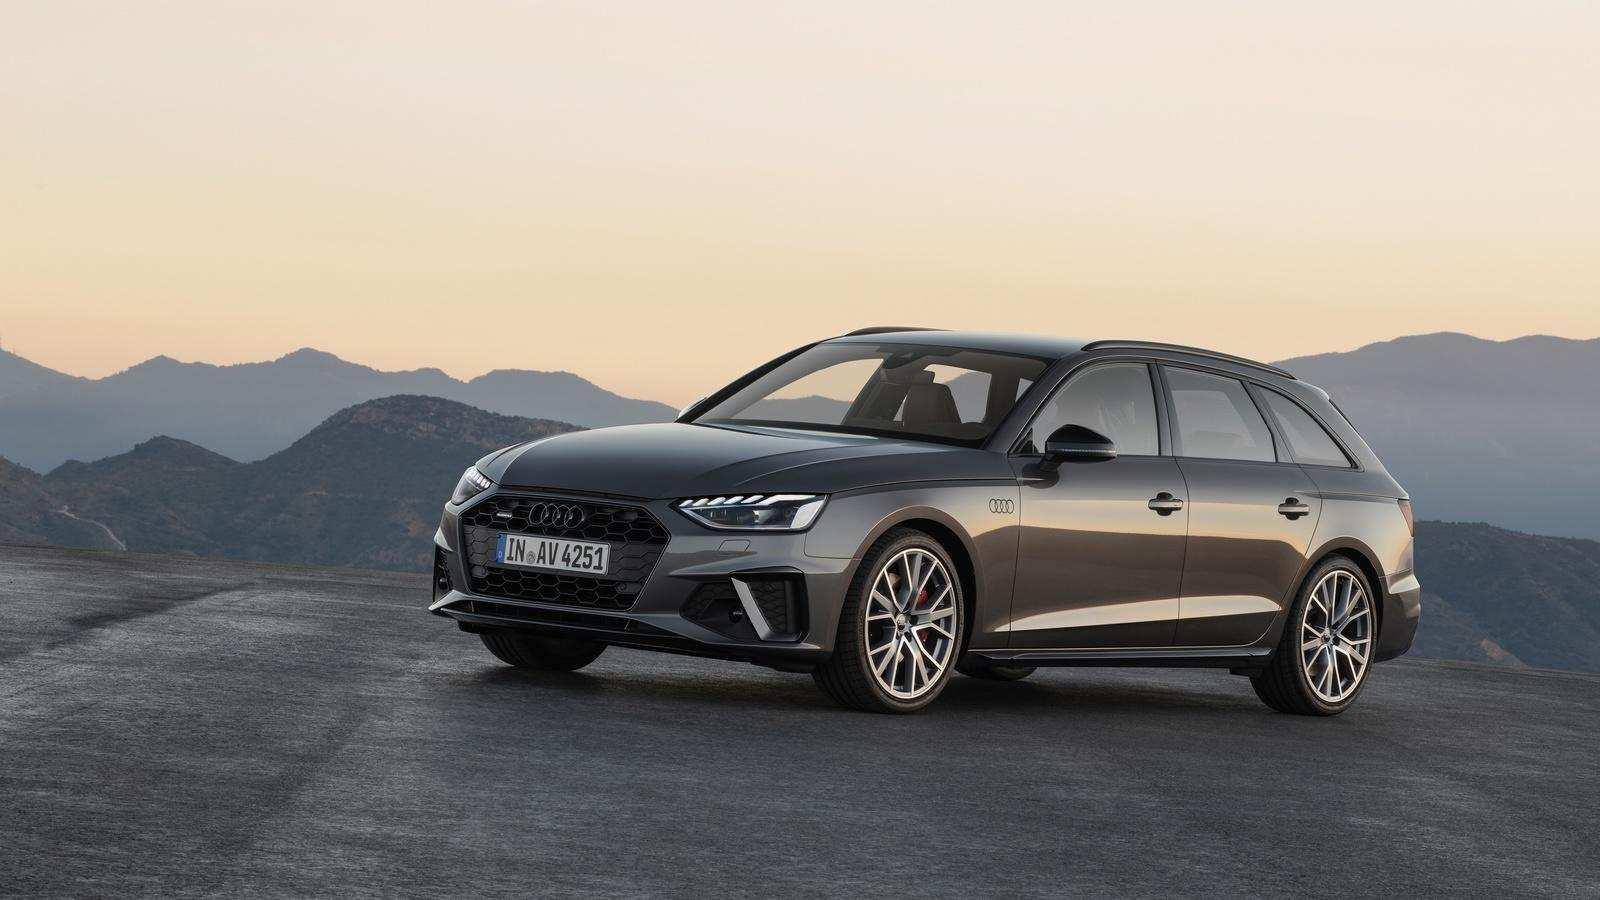 44 All New Audi A4 Kombi 2020 Model for Audi A4 Kombi 2020